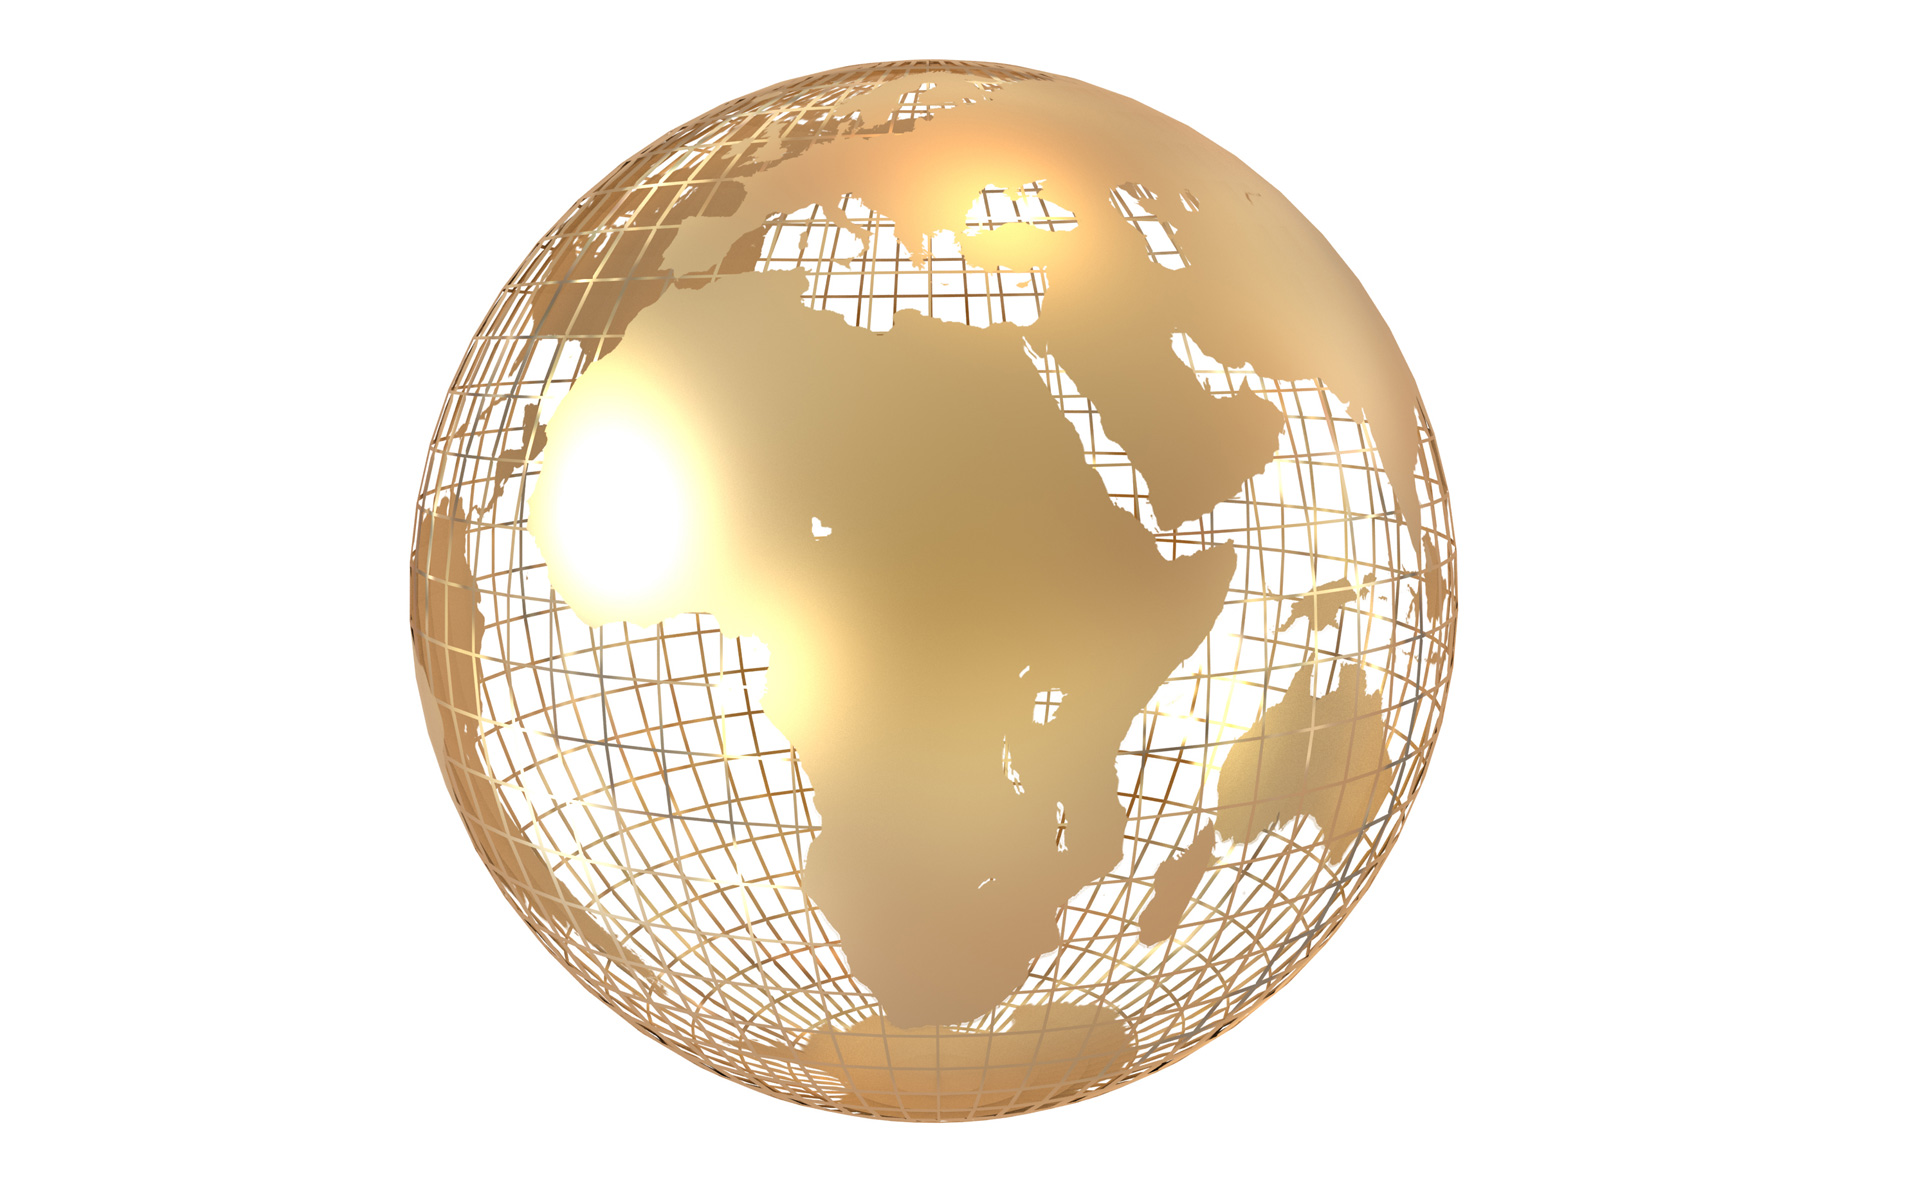 Worldwide Chauffeured Services